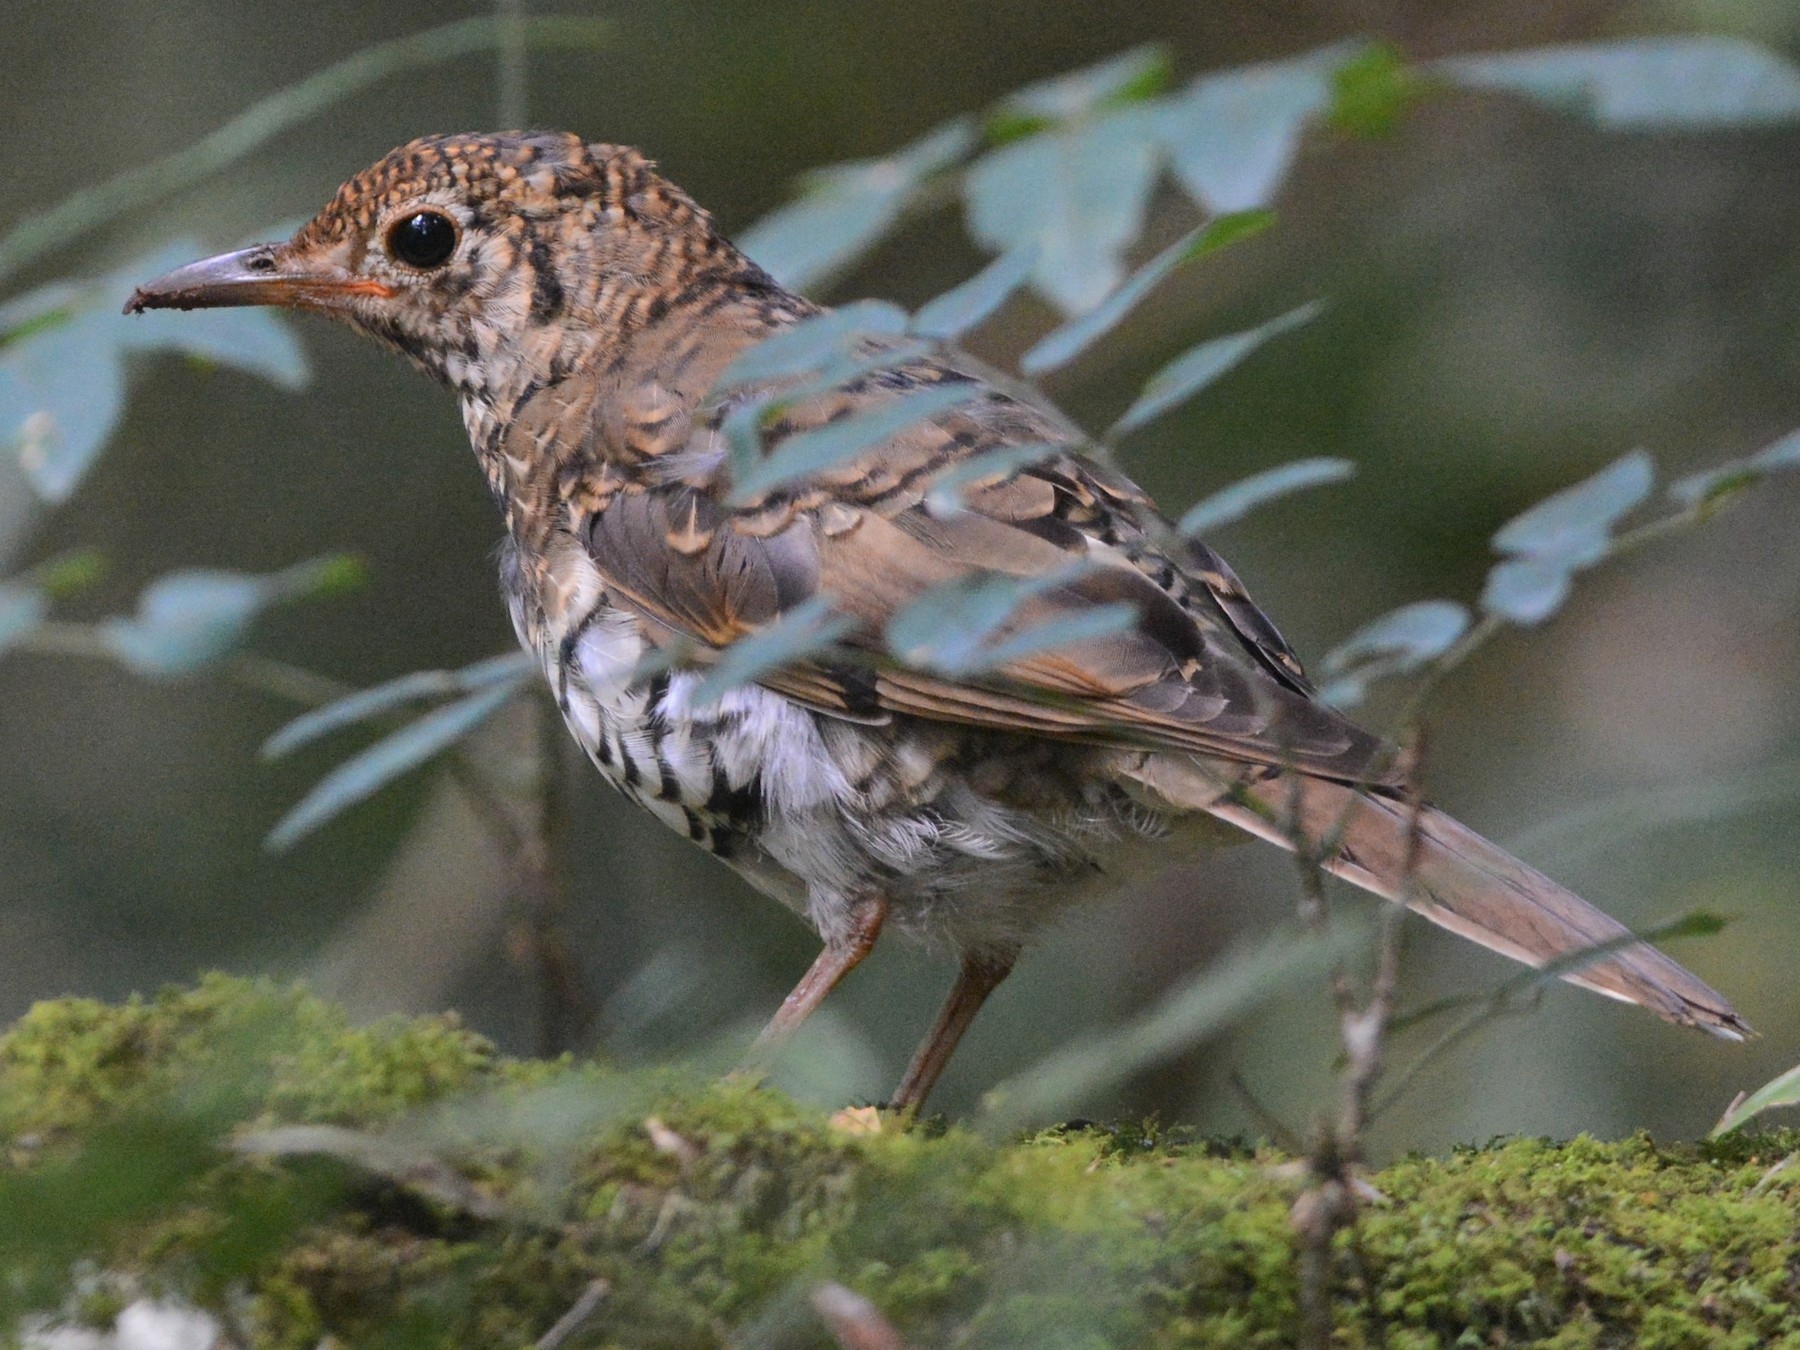 Russet-tailed Thrush - David Hollie